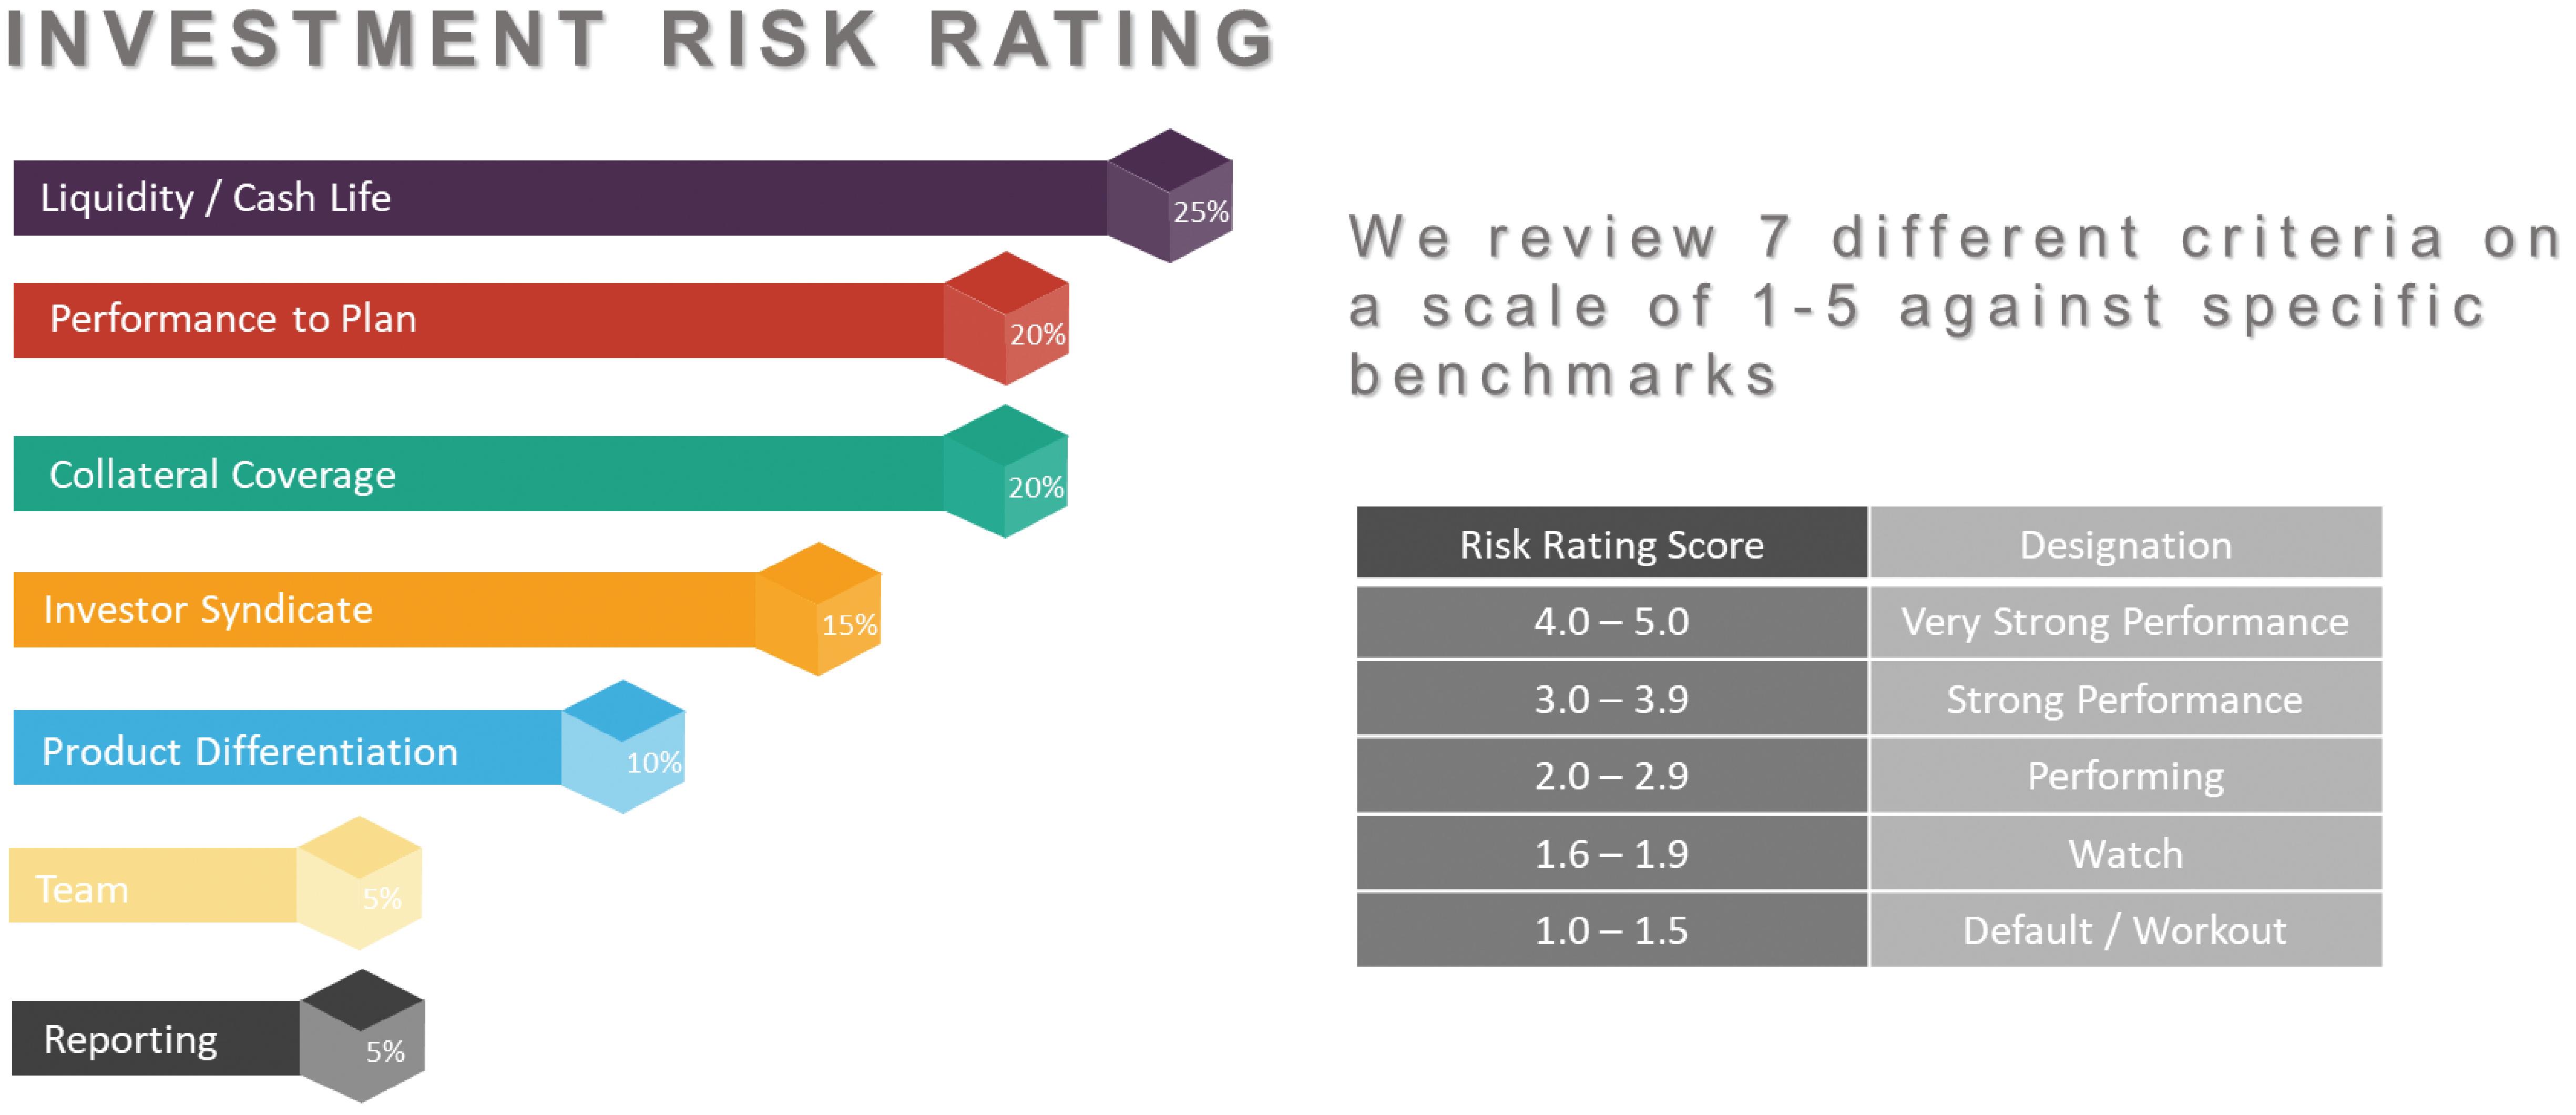 [MISSING IMAGE: tm2012647d1-bc_risk4clr.jpg]